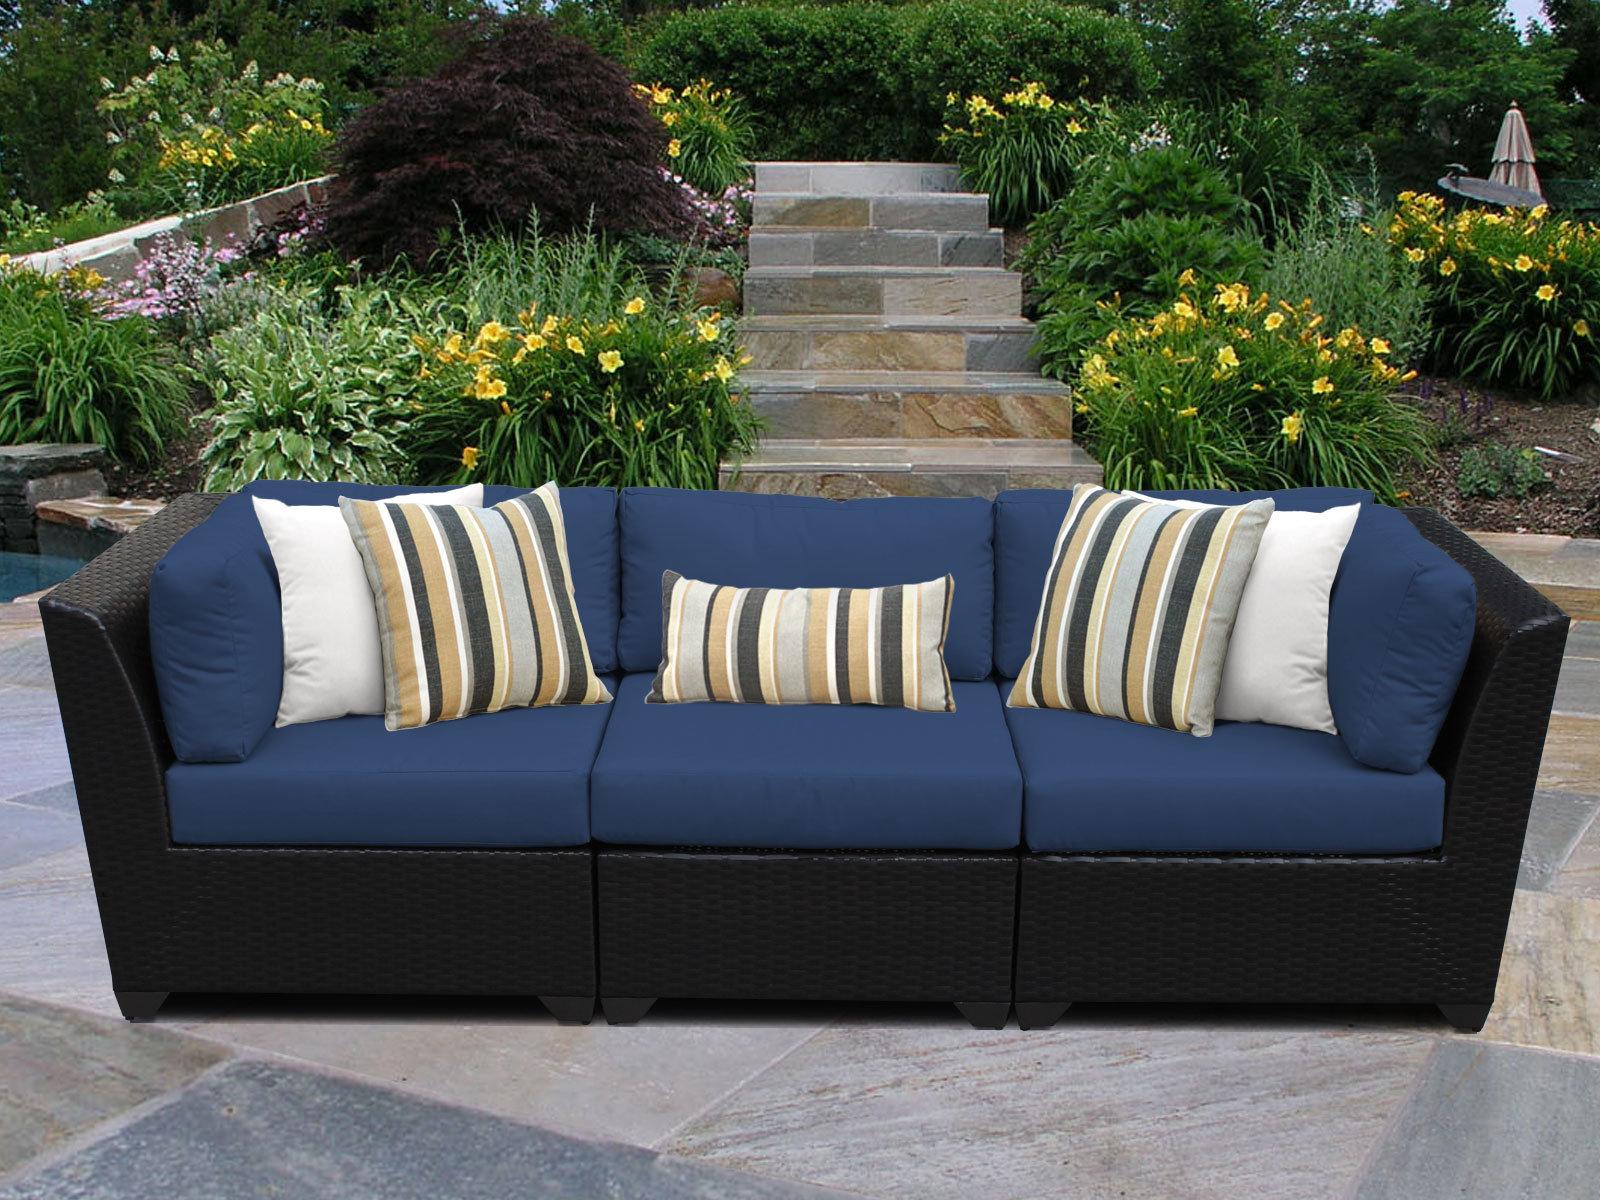 Well Liked Camak Patio Sofa With Cushions Inside Camak Patio Loveseats With Cushions (View 20 of 20)